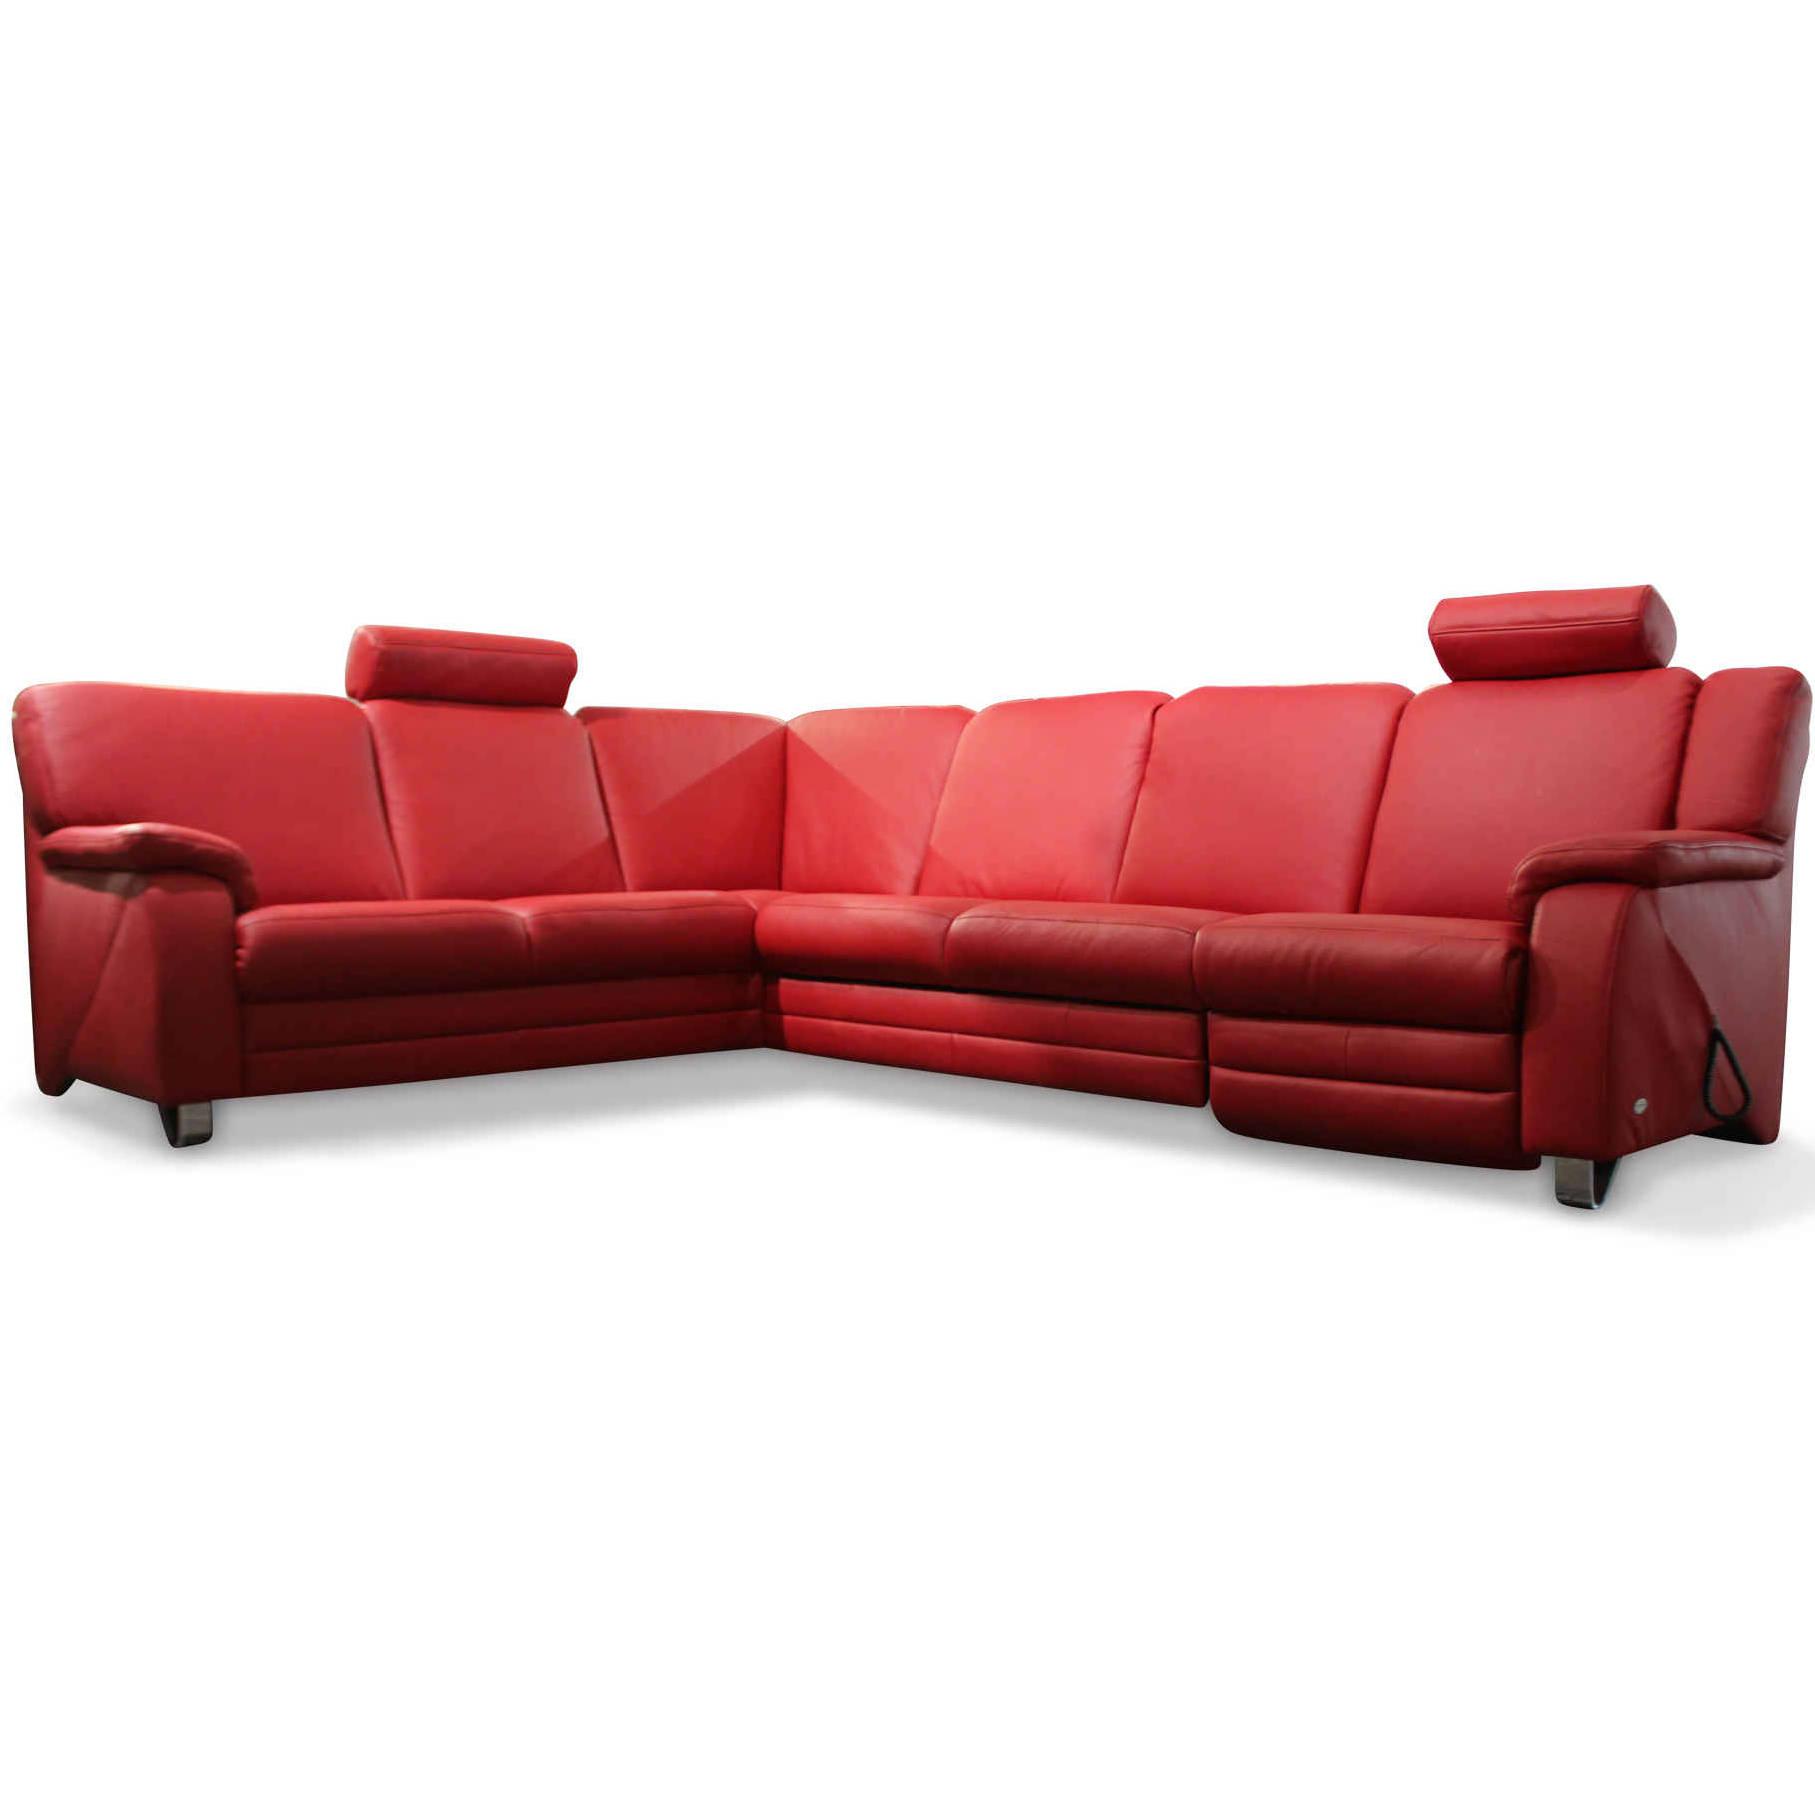 himolla designer ecksofa 1100 leder metall rot chrom ebay. Black Bedroom Furniture Sets. Home Design Ideas